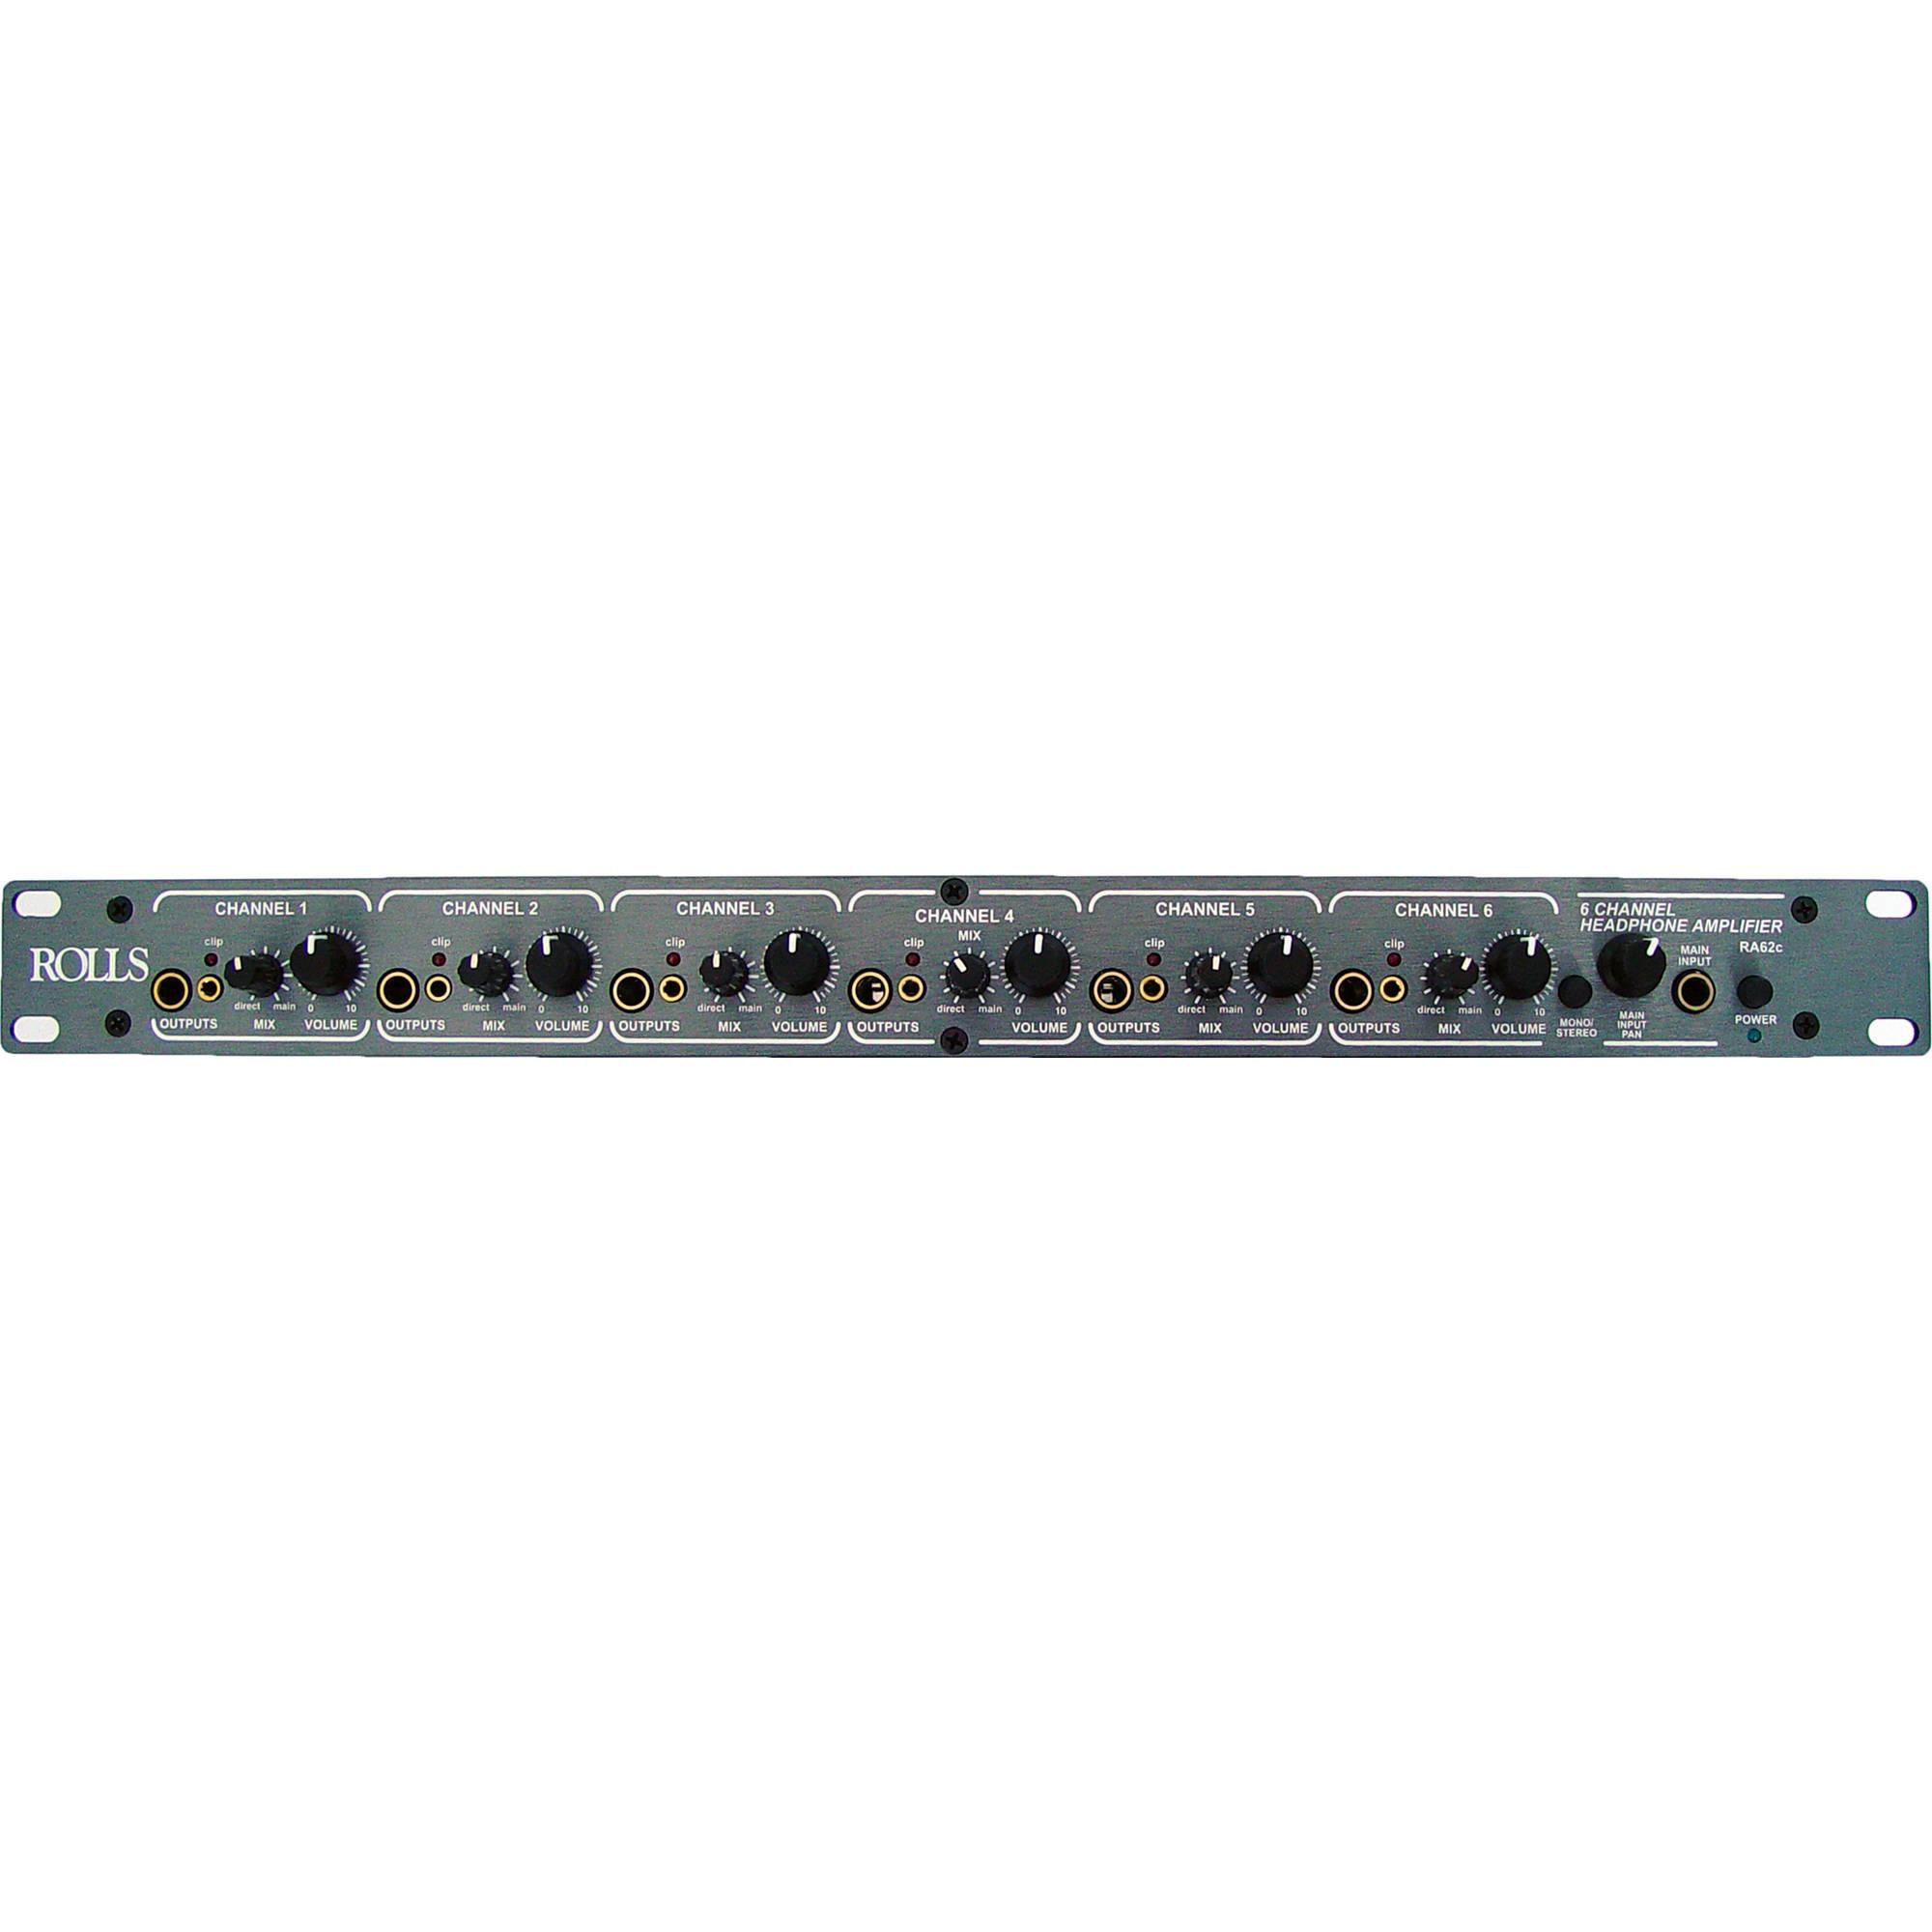 Rolls Ra62c 6 Channel Headphone Amplifier Bh Photo Video Circuit Diagram Of Audio Mixer